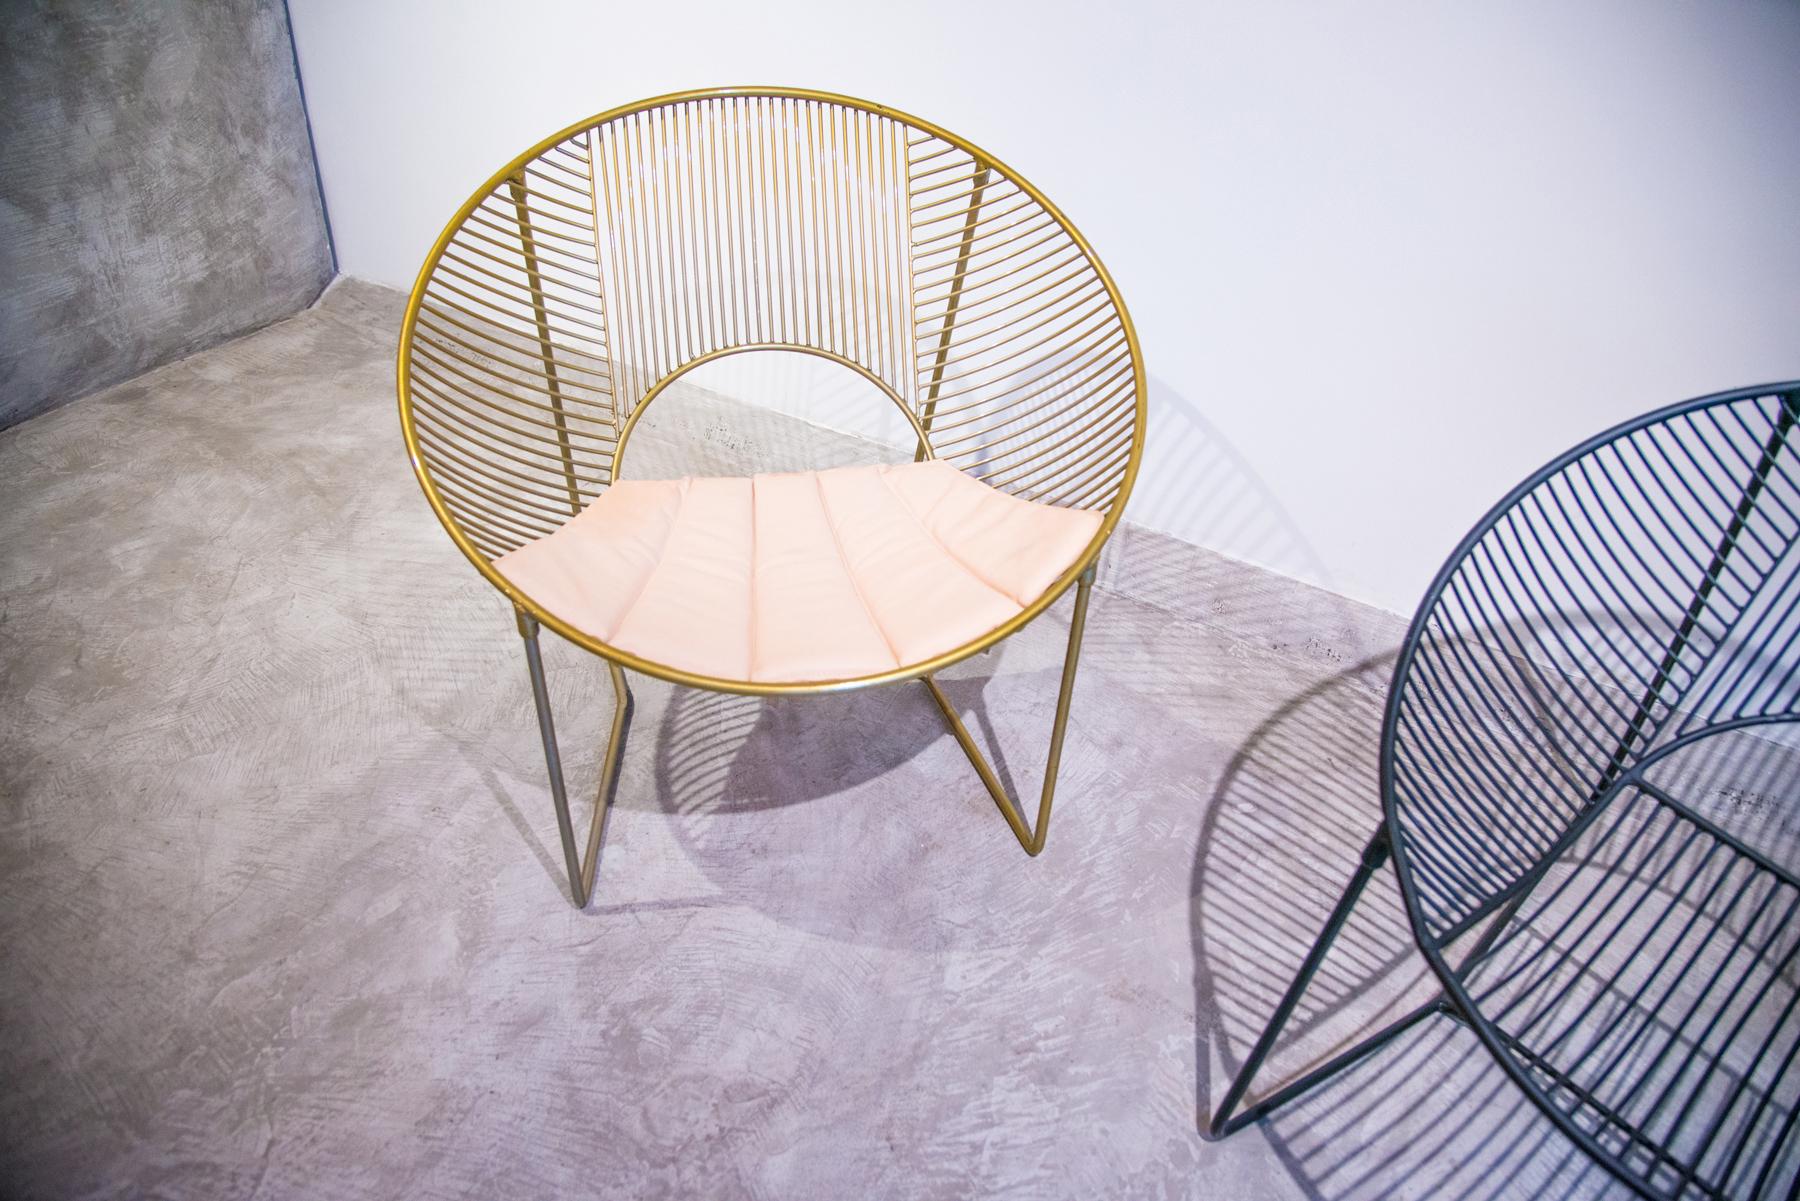 DSC_9474-tienda-cali-sillas-tienda-slider